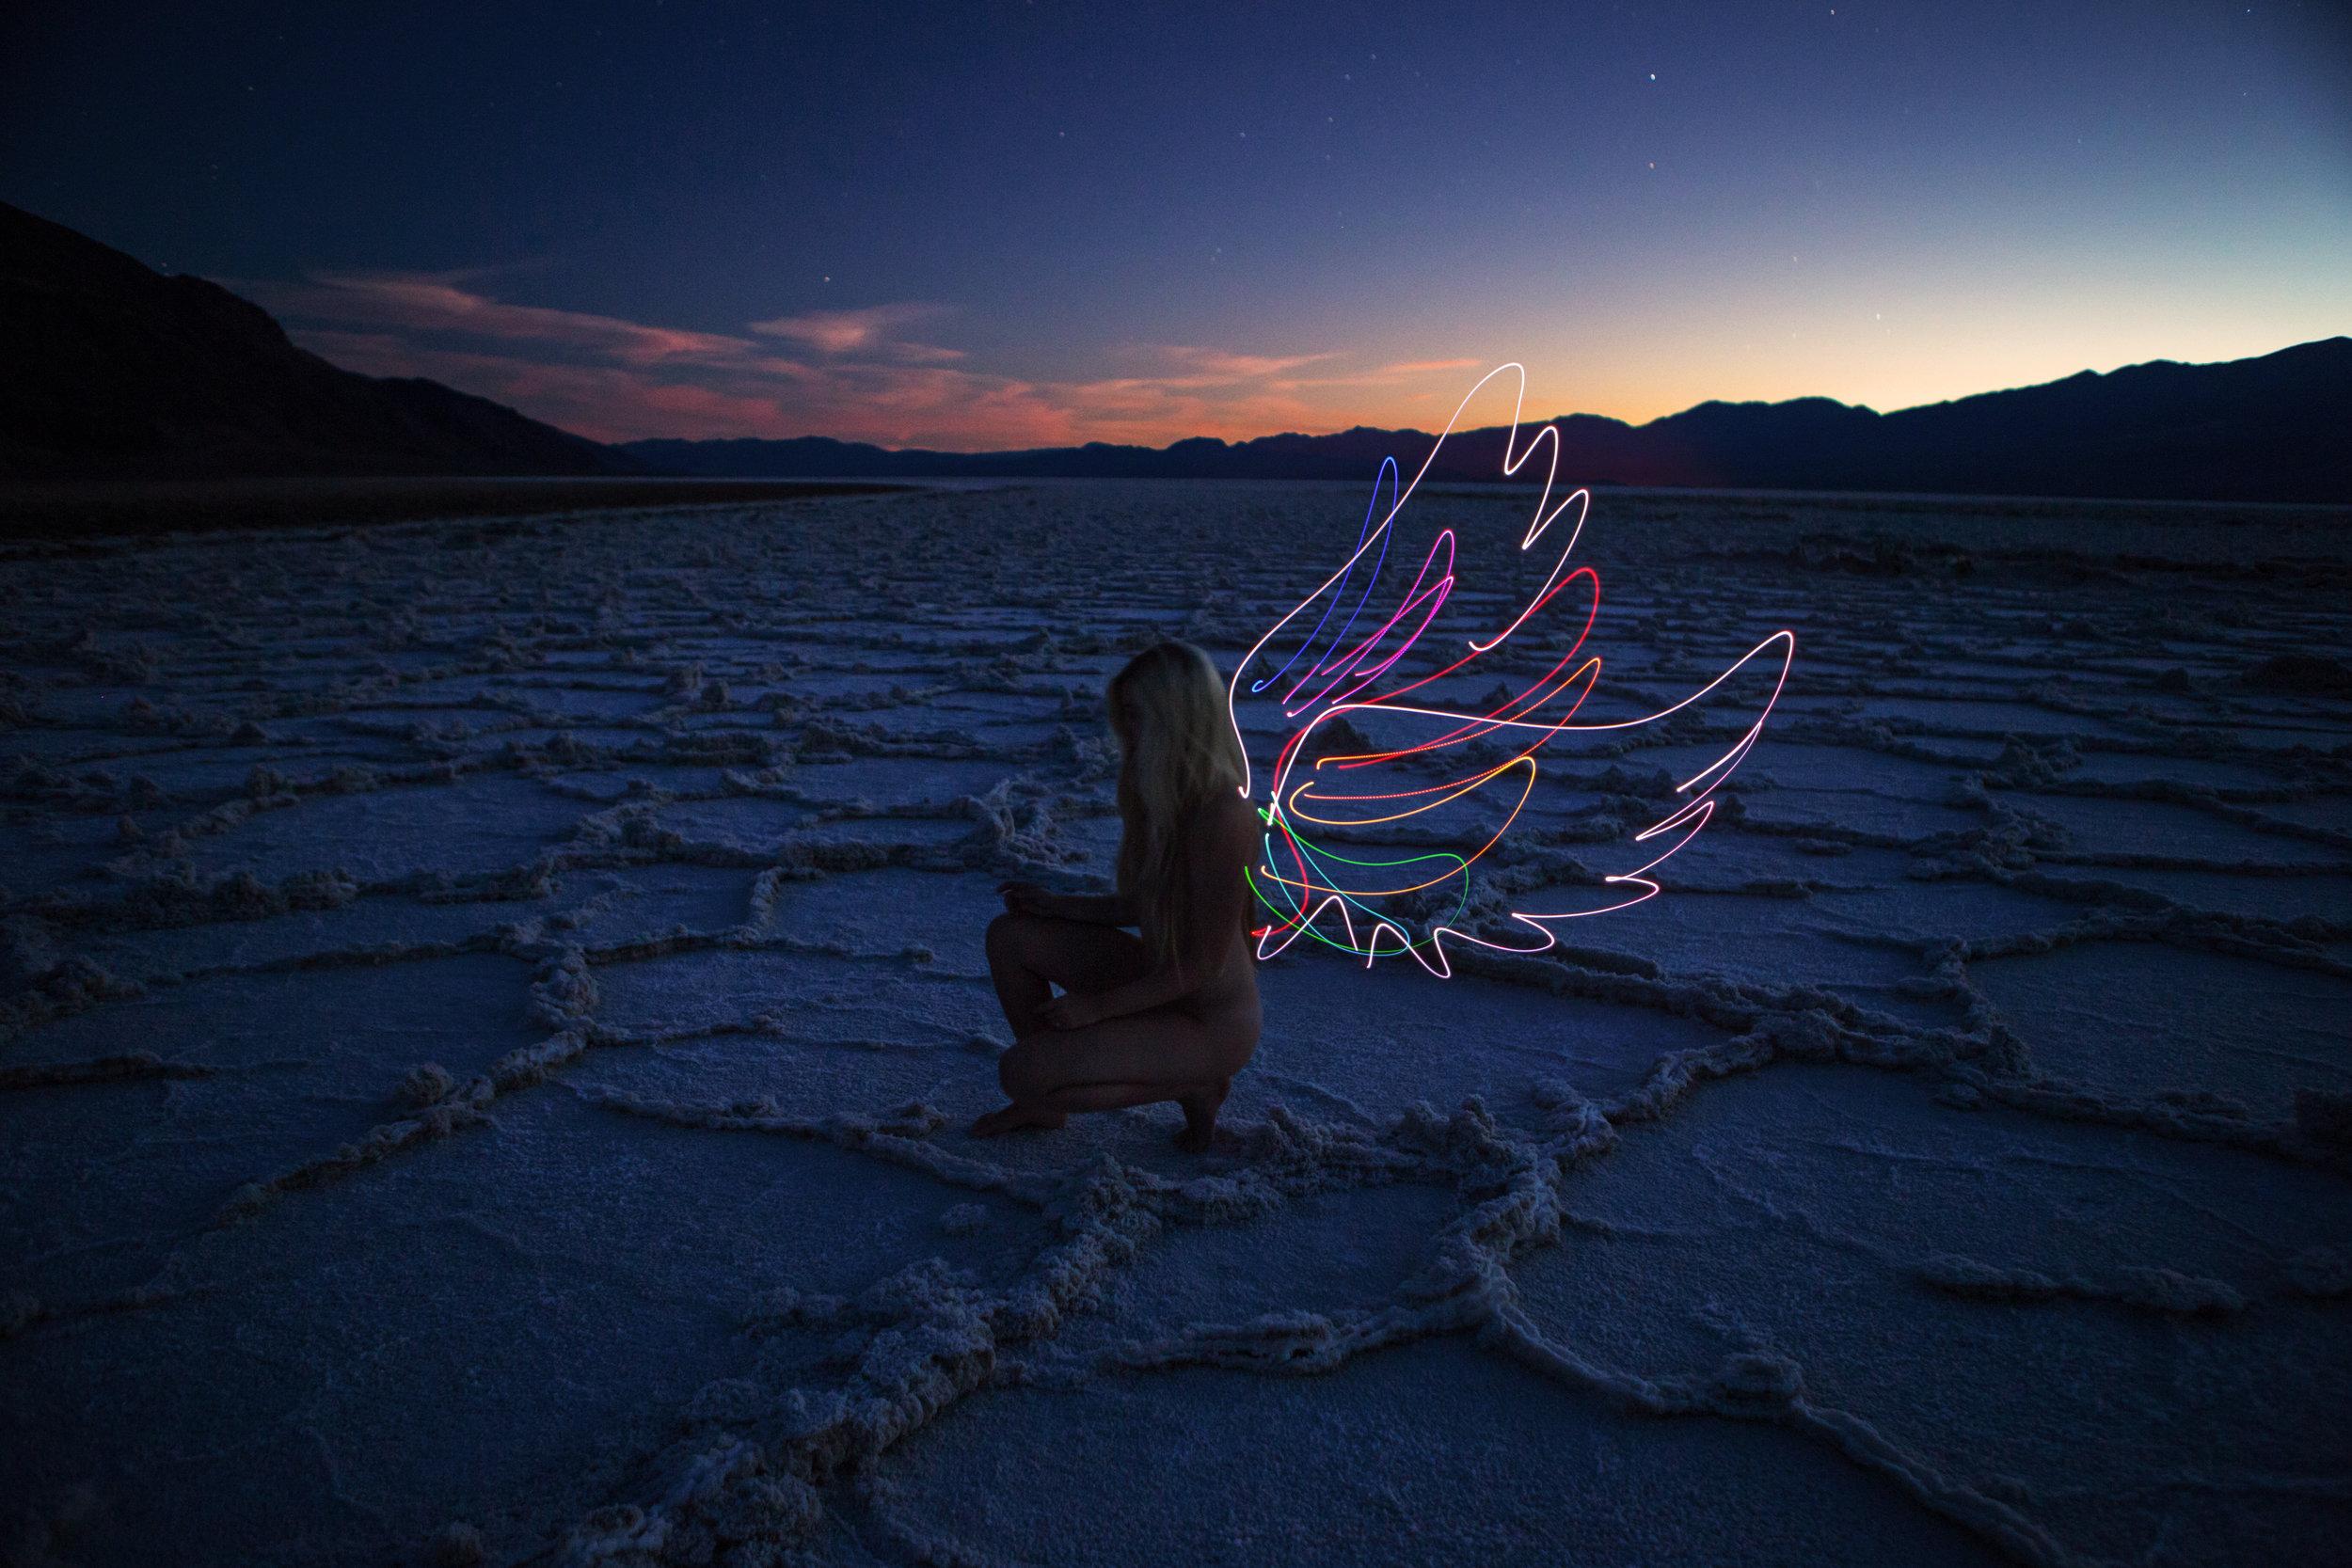 AstroBandit_JordanRose_DariusTwin_DarrenPearson_LightPainting_BadwaterBasin_DeathValley_BlueHour_Angel.jpg